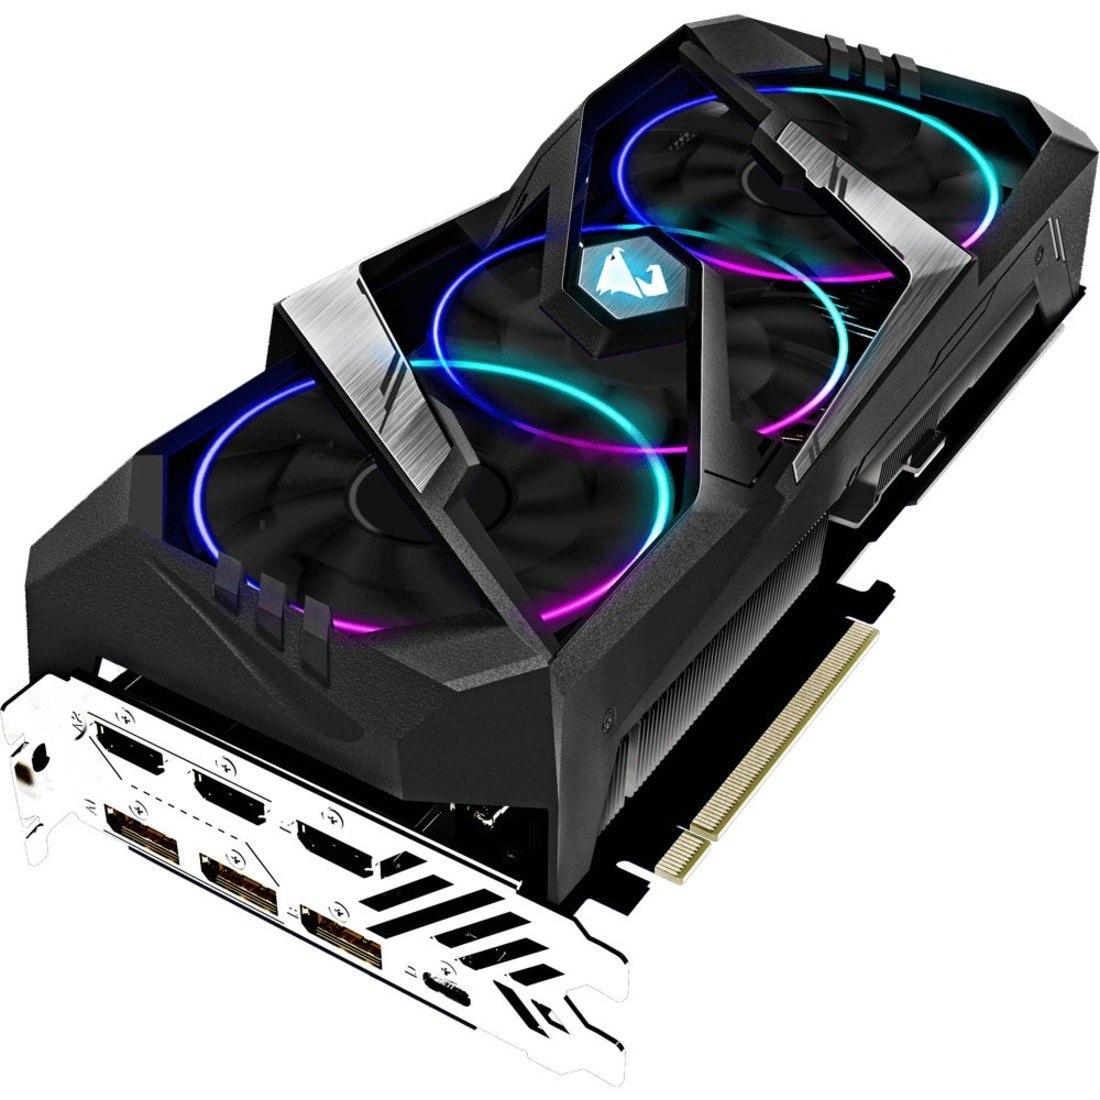 Aorus GV-N207SAORUS-8GC GeForce RTX 2070 SUPER Graphic Card - 8 GB GDDR6